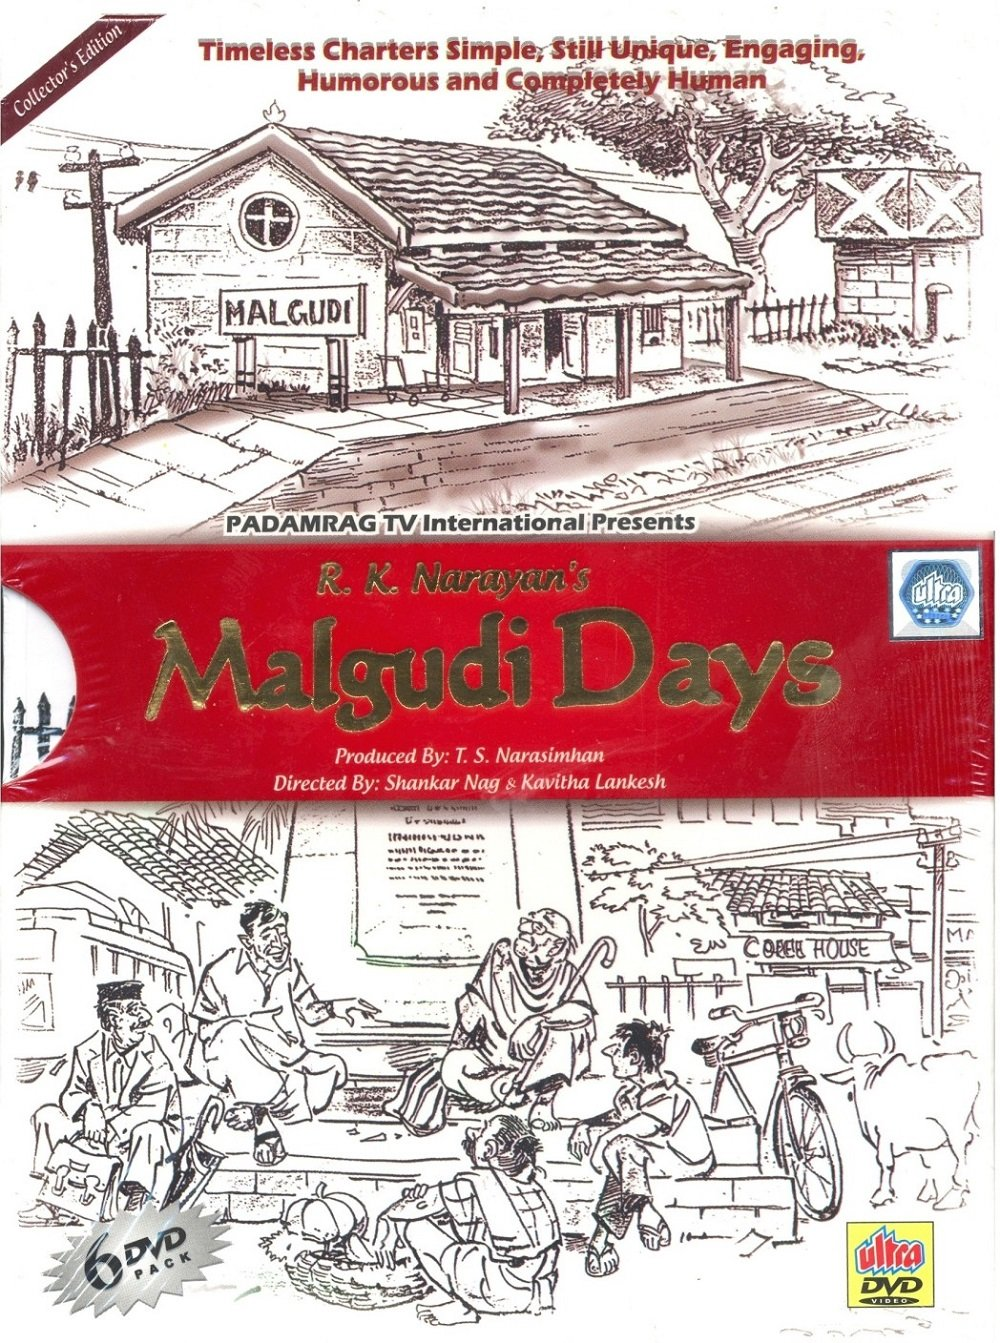 Amazon.in: Buy Malgudi Days - 6 Dvd Premium Pack DVD, Blu-ray Online ...